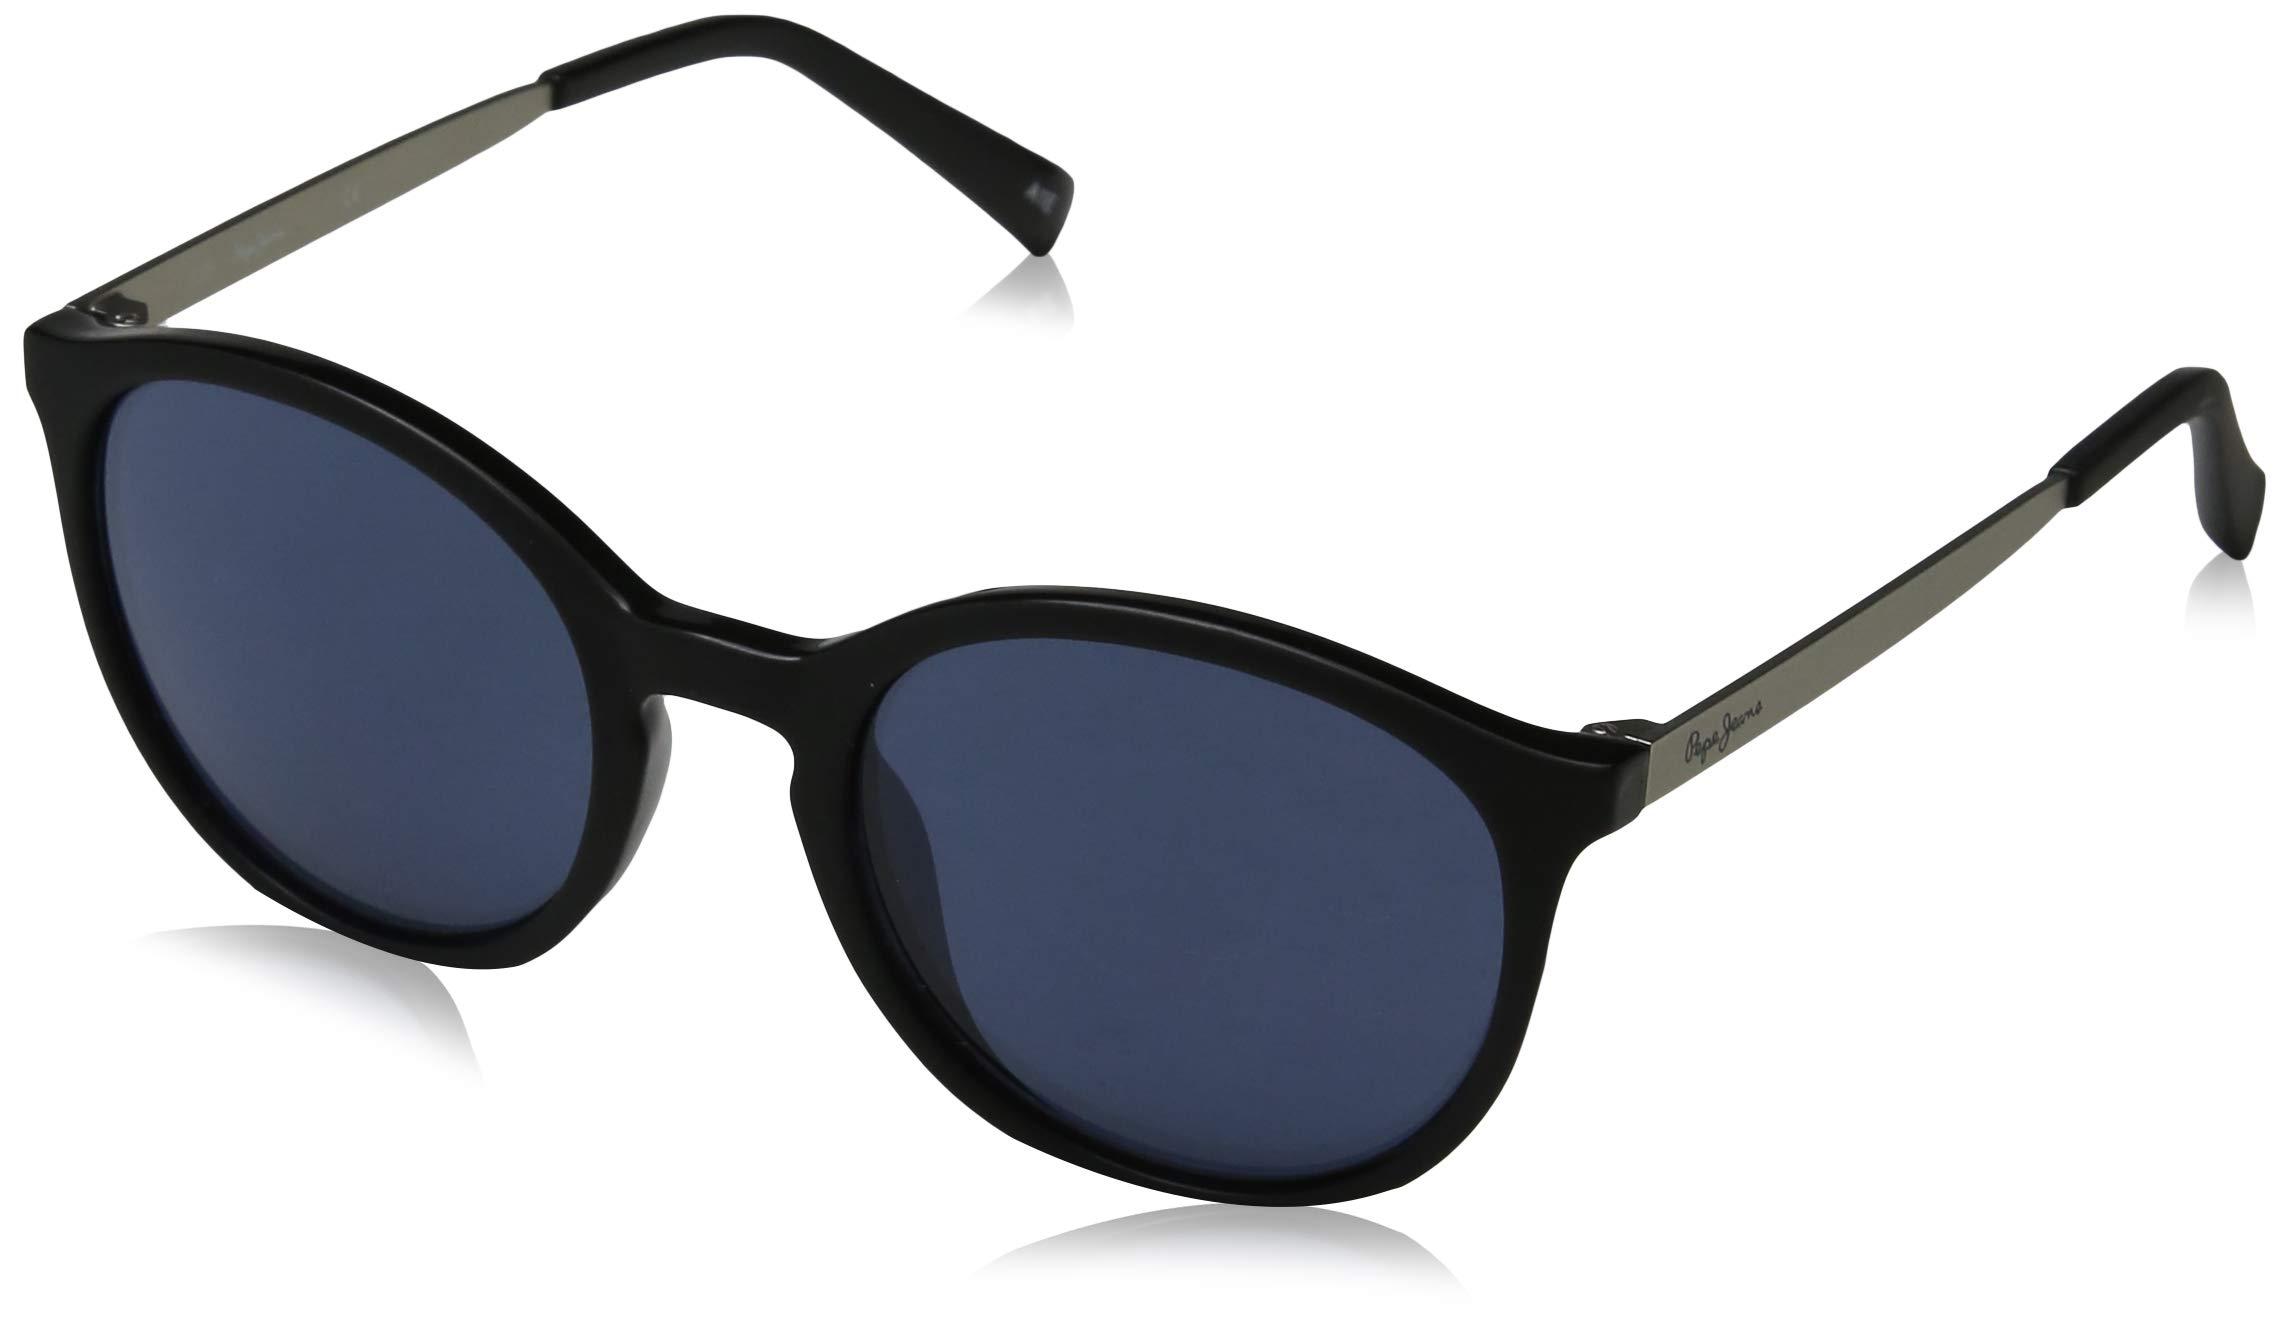 Montures LunettesNoirblack Sunglasses 0 Jeans De Pepe blue49 Garnet Femme 8m0NwvnO